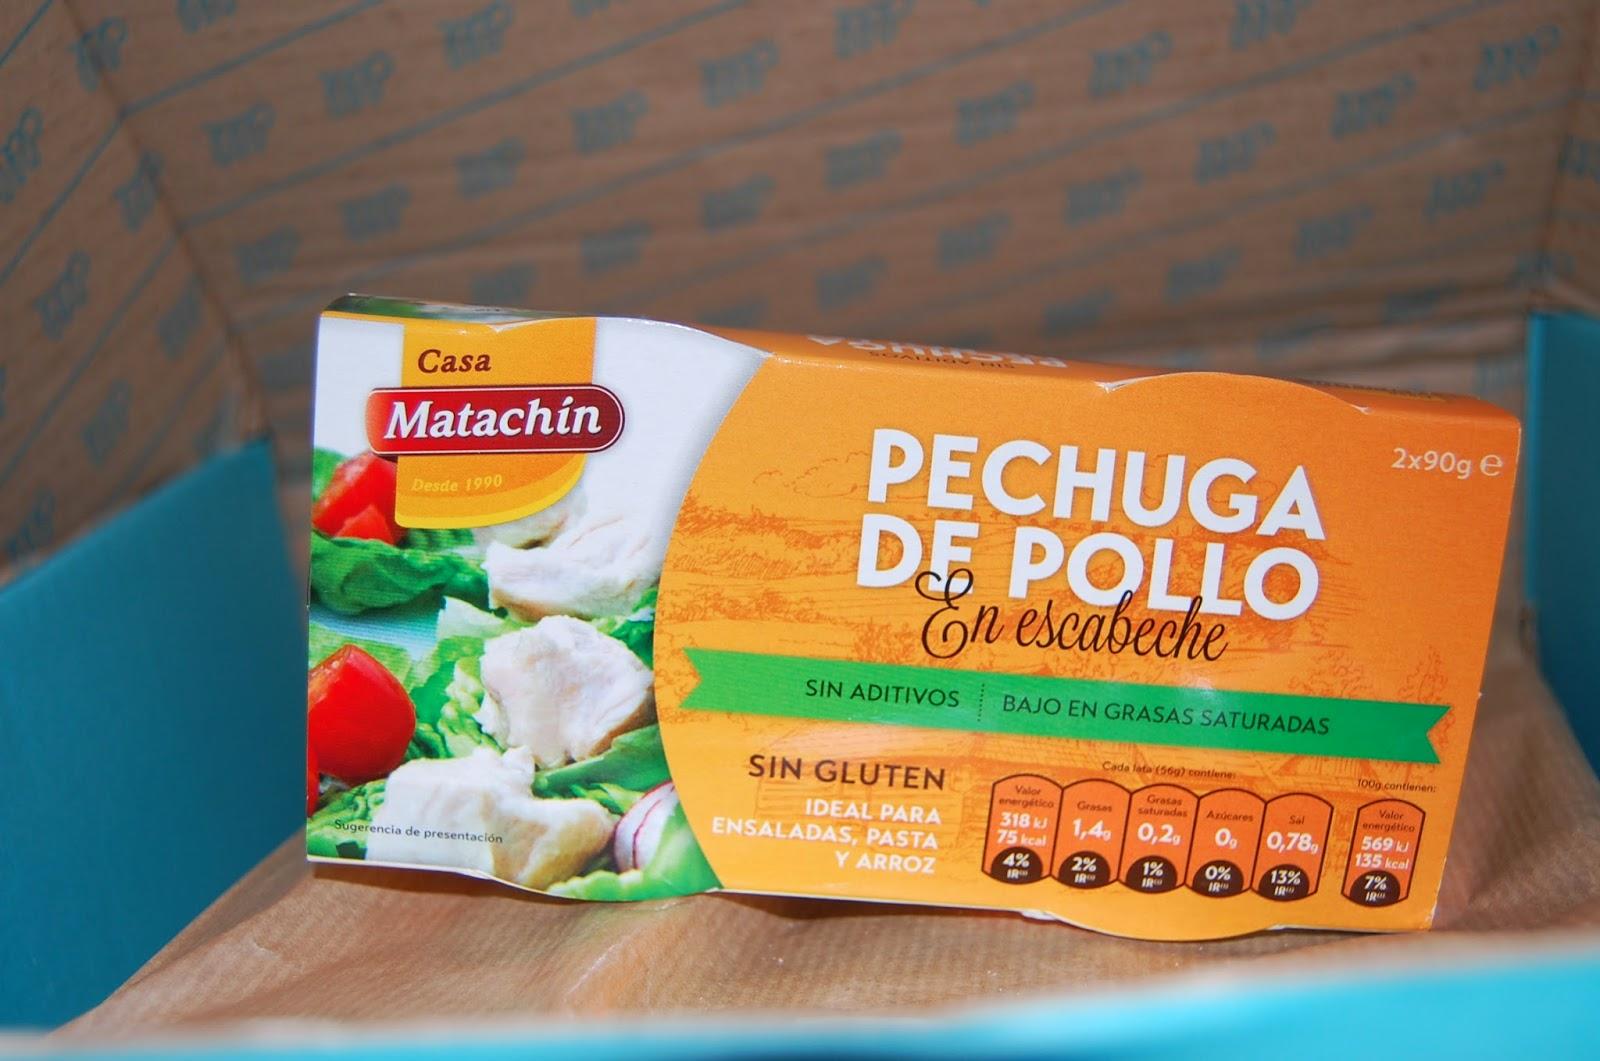 POLLO EN ESCABECHE CASA MATACHÍN - MUESTRAS PREMIUM ABRIL 2014